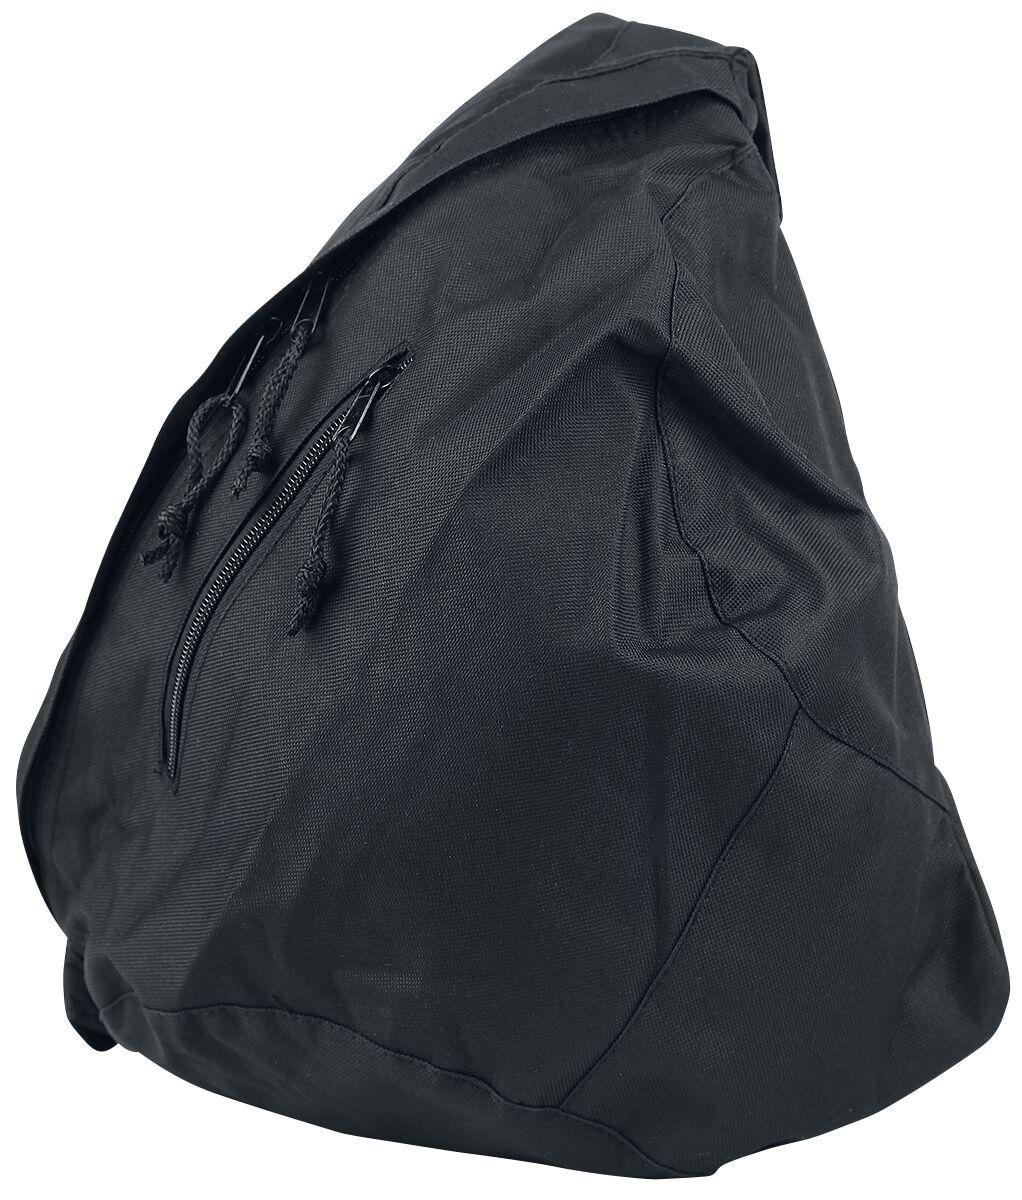 Basics - Torby i Plecaki - Torba na ramię Brooklyn Shoulder Bag Torba na ramię czarny - 343684